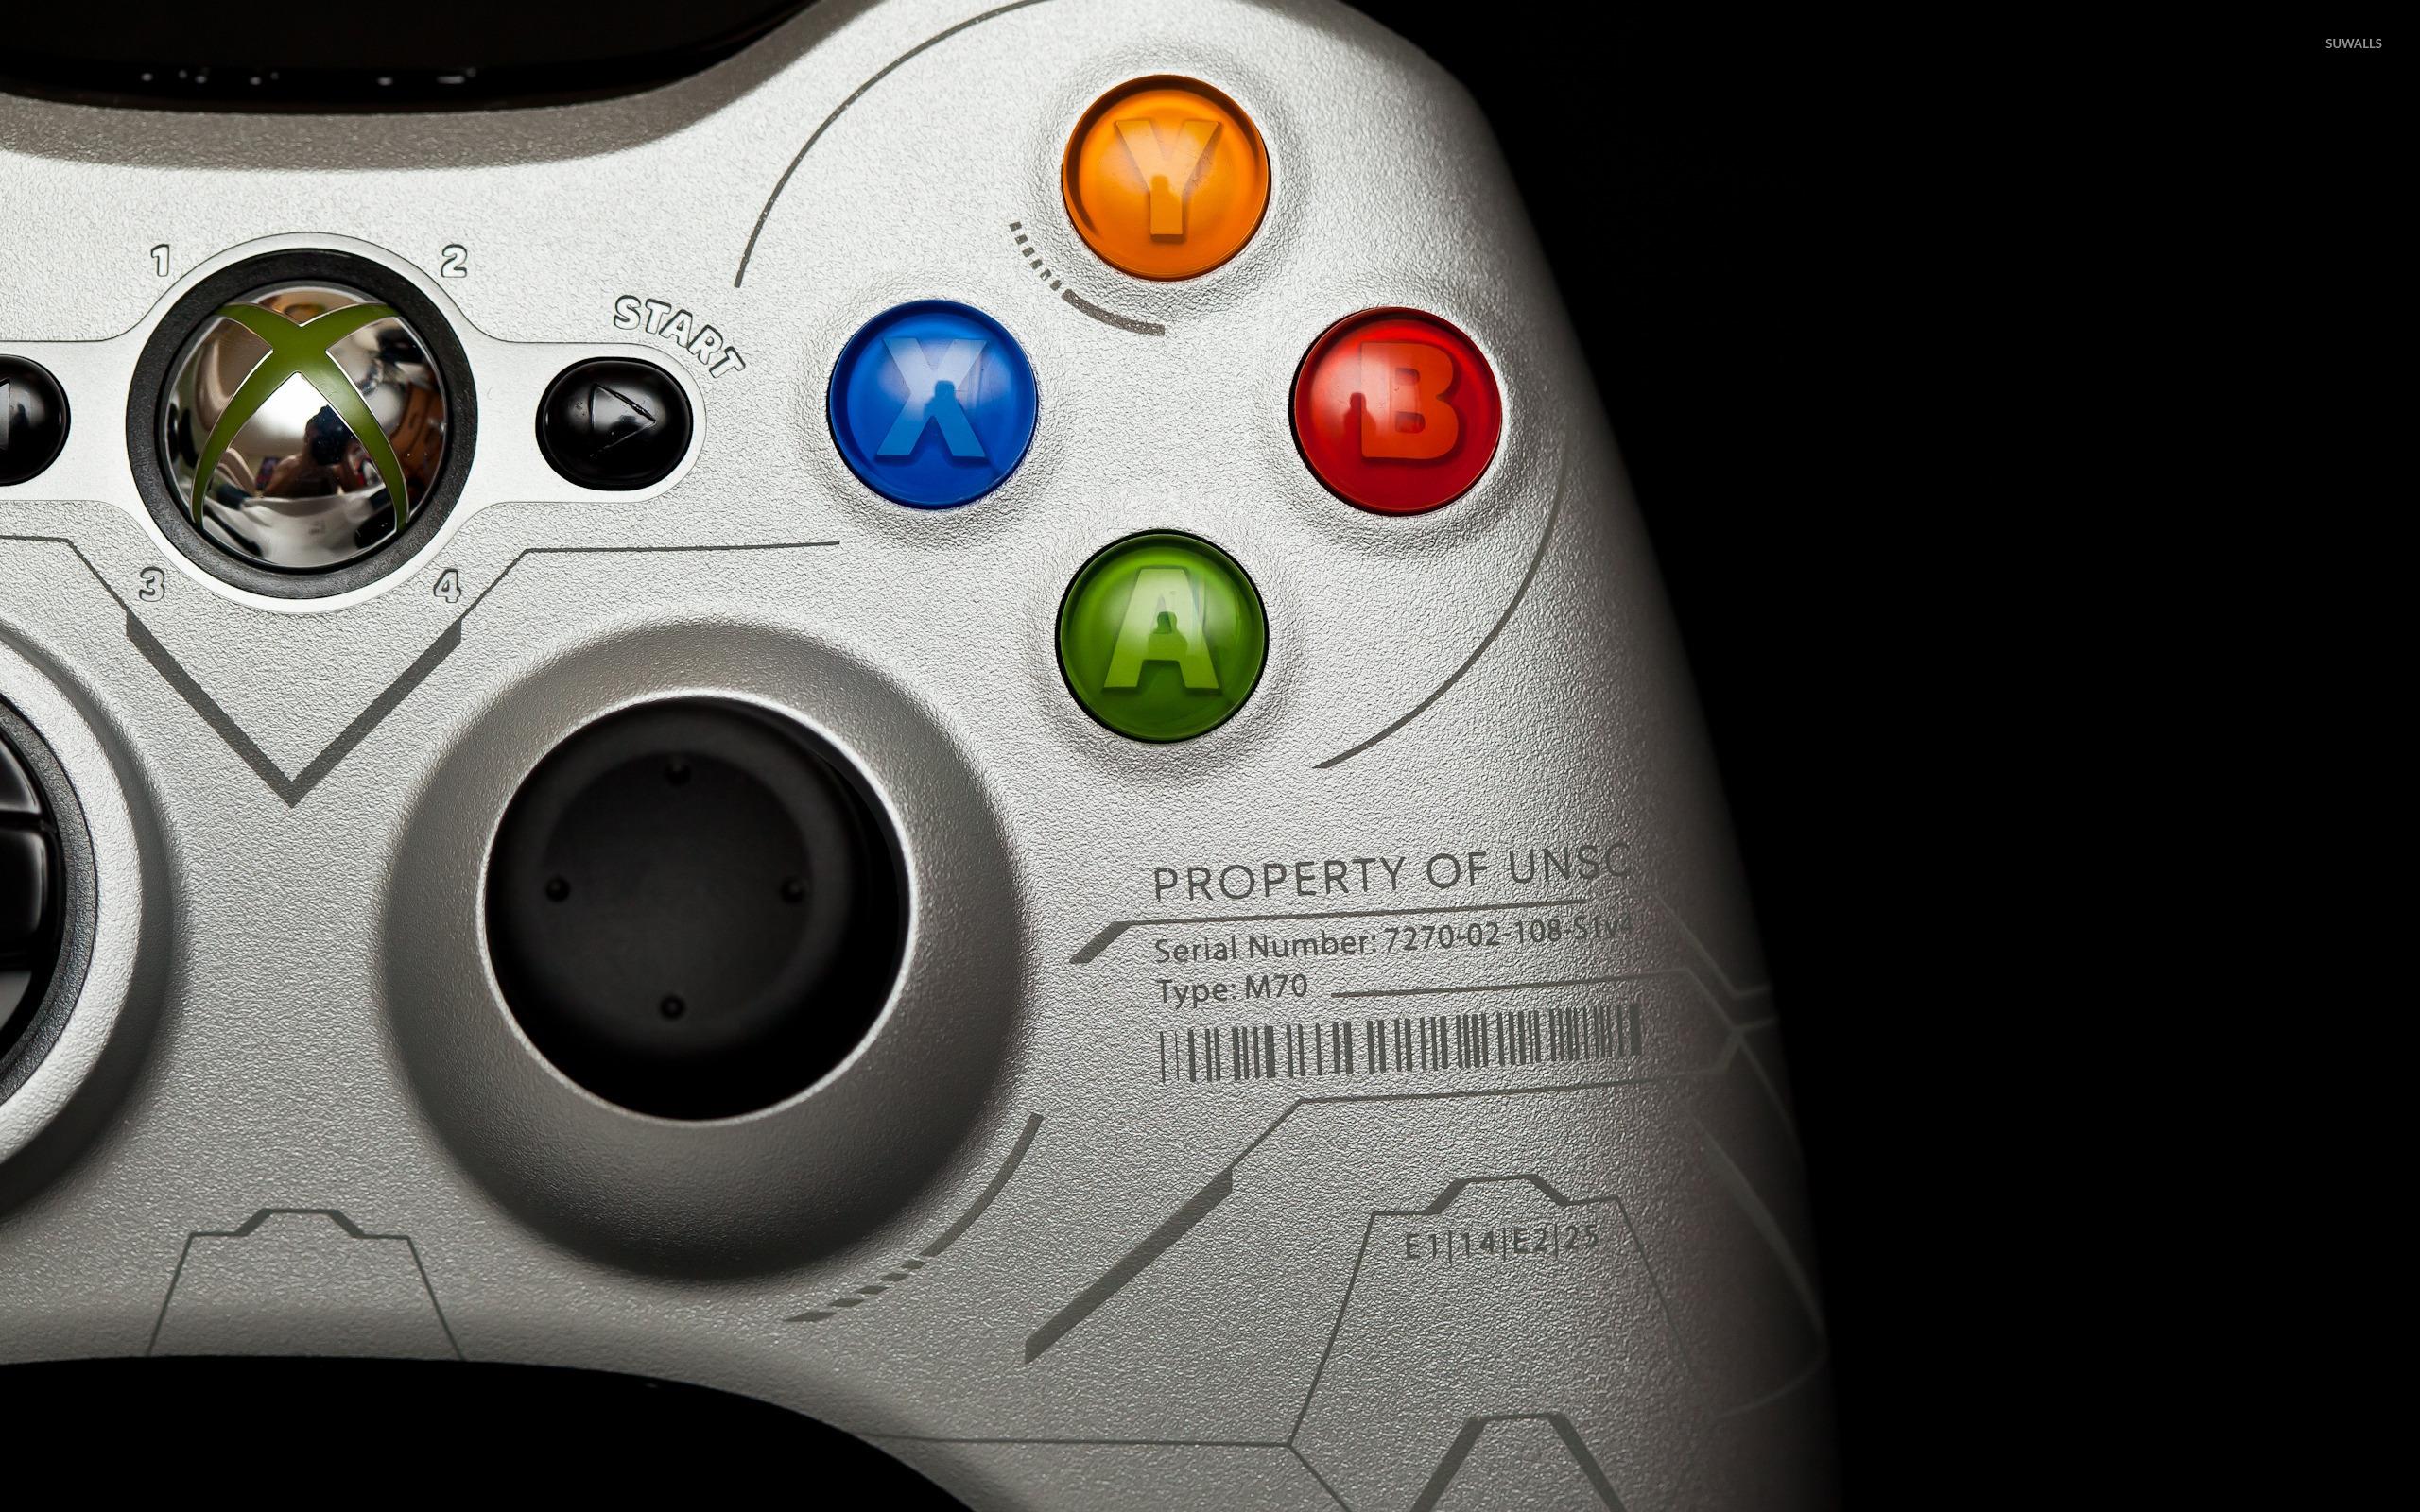 Xbox 360 Silver Controller Wallpaper Computer Wallpapers 47619